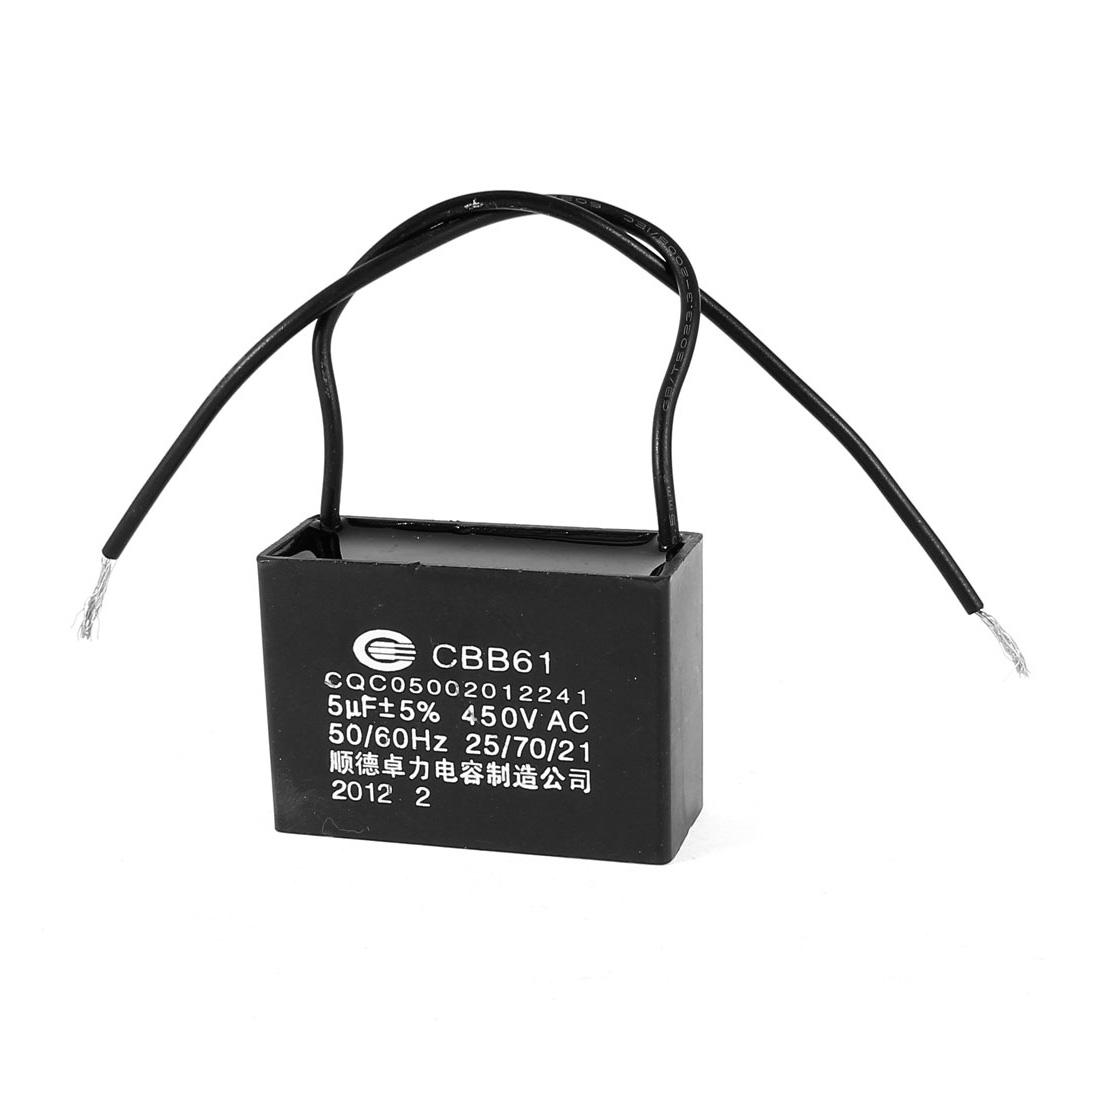 AC 450V 5uF 50/60Hz 5% 2-Wire Metalized Polypropylene Film Motor Capacitor Black